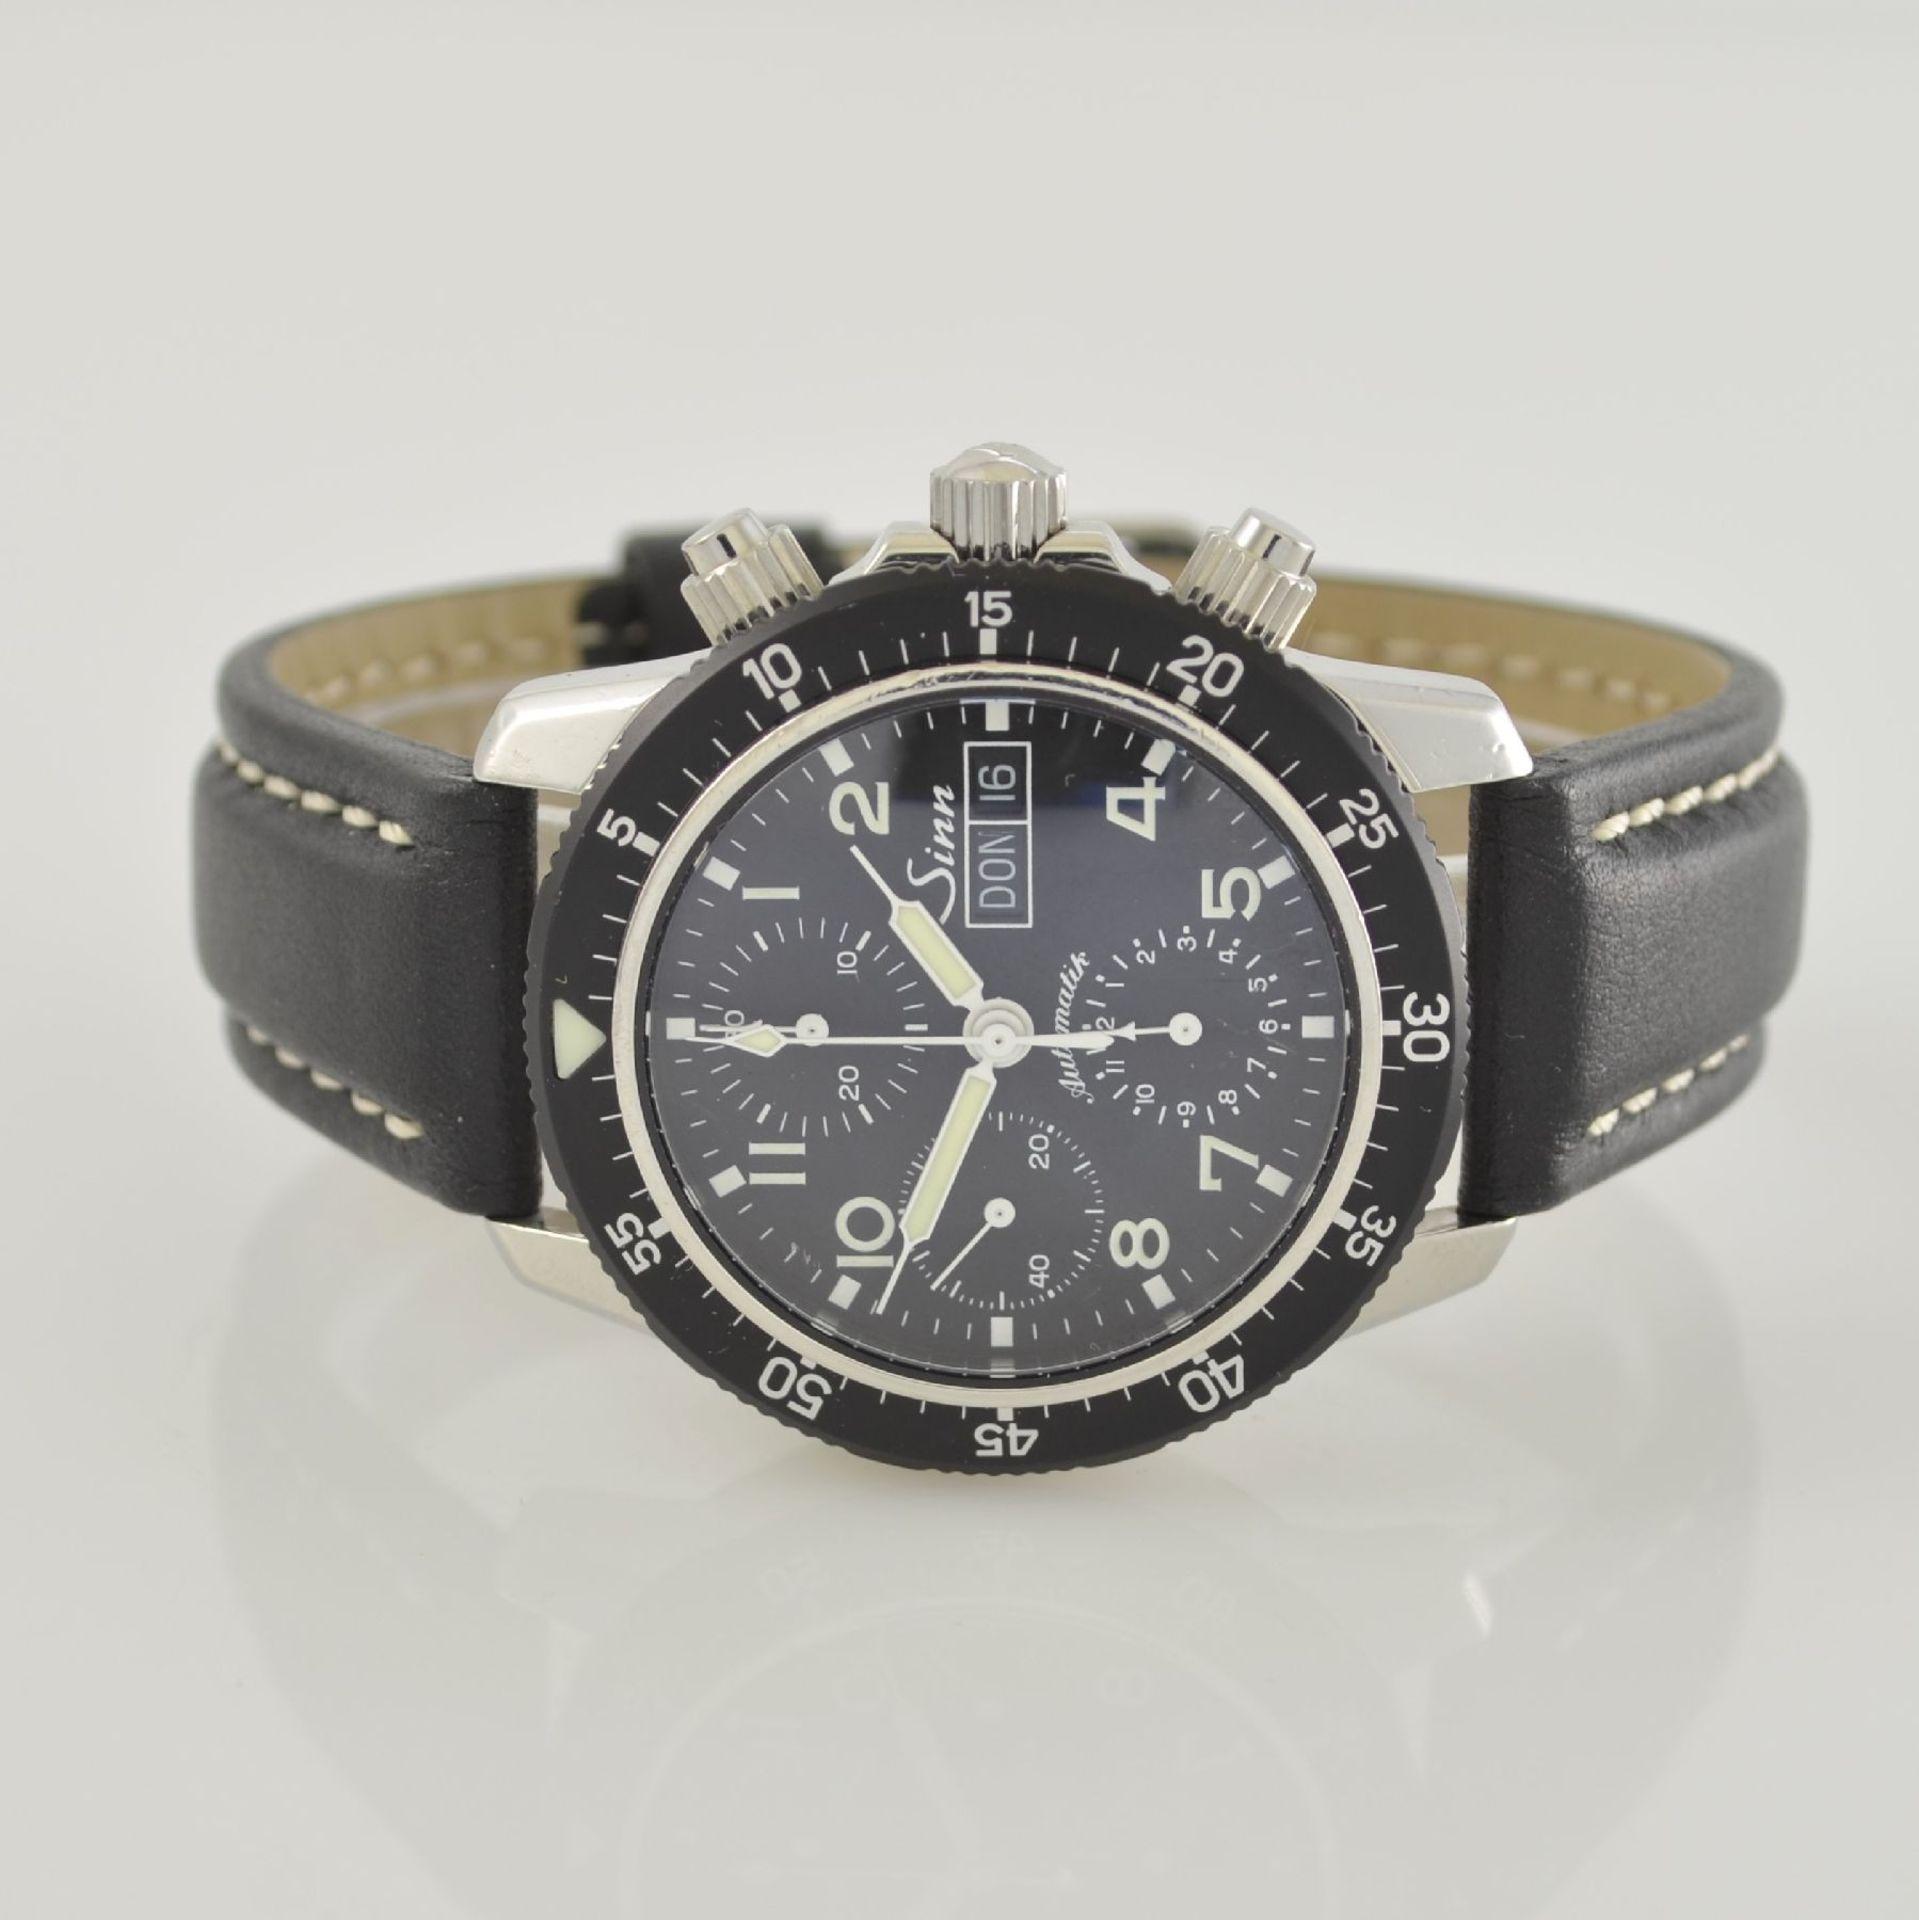 SINN Armbandchronograph, Automatik, Schweiz um 2010, pol. Edelstahlgeh. inkl. orig. Lederband m.